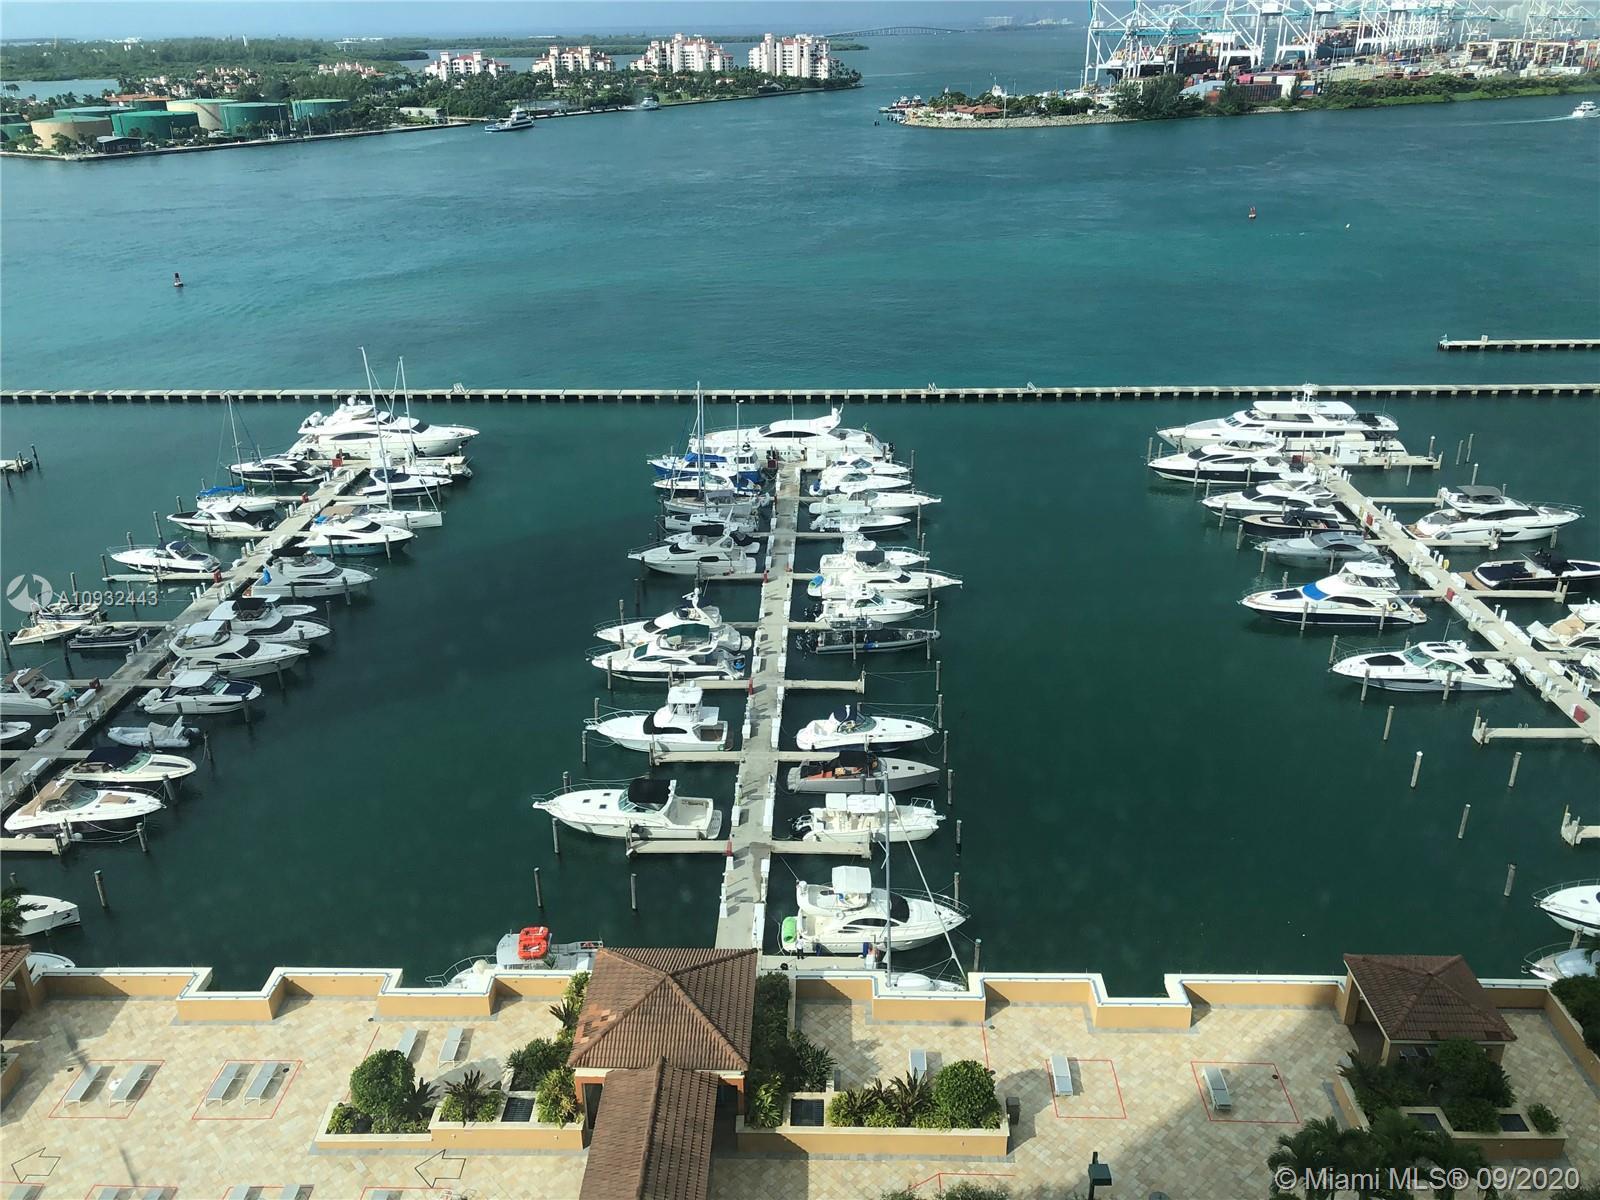 Miami Beach, Cays